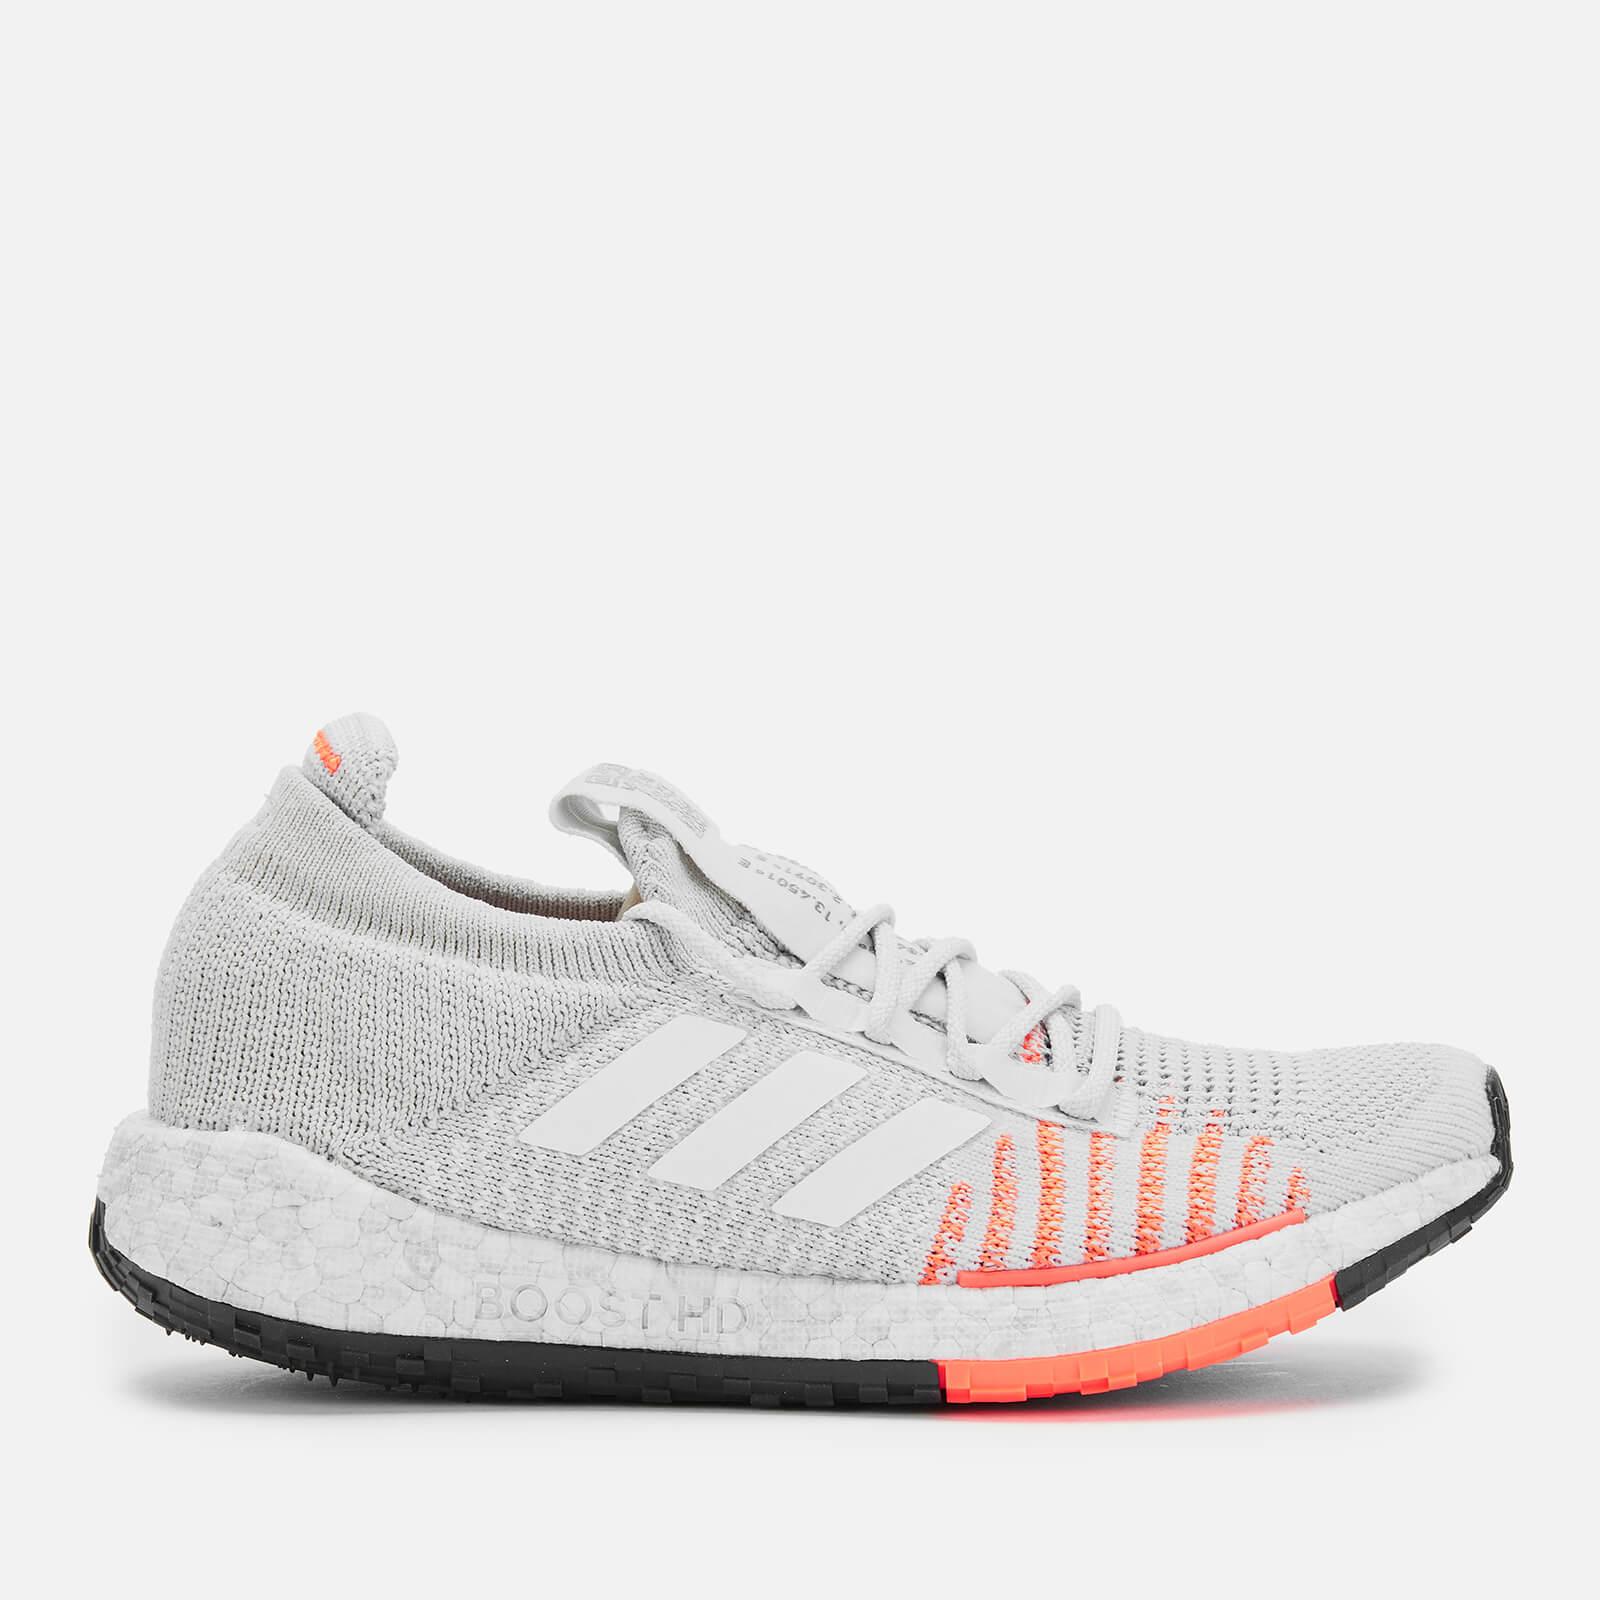 adidas Women's Pulse Boost HD Trainers - Grey/Orange - UK 4 - Grey